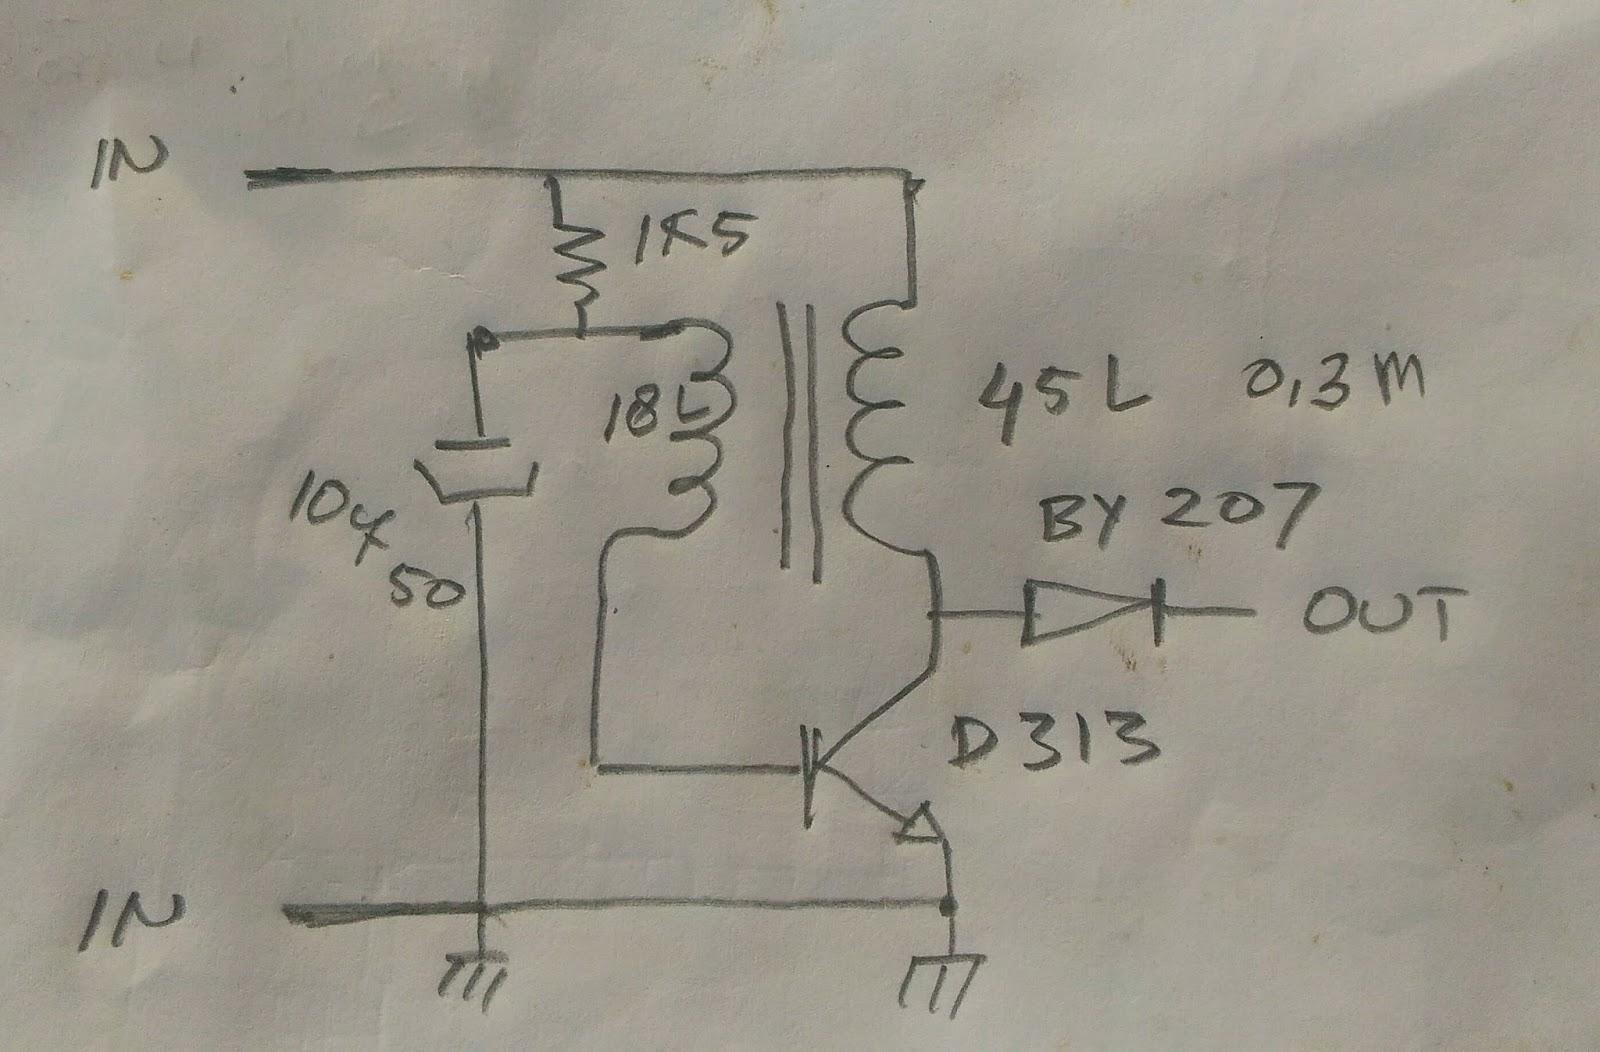 Membuat Rangkaian Dc To Dc Inverter Sederhana Flyin Dvb